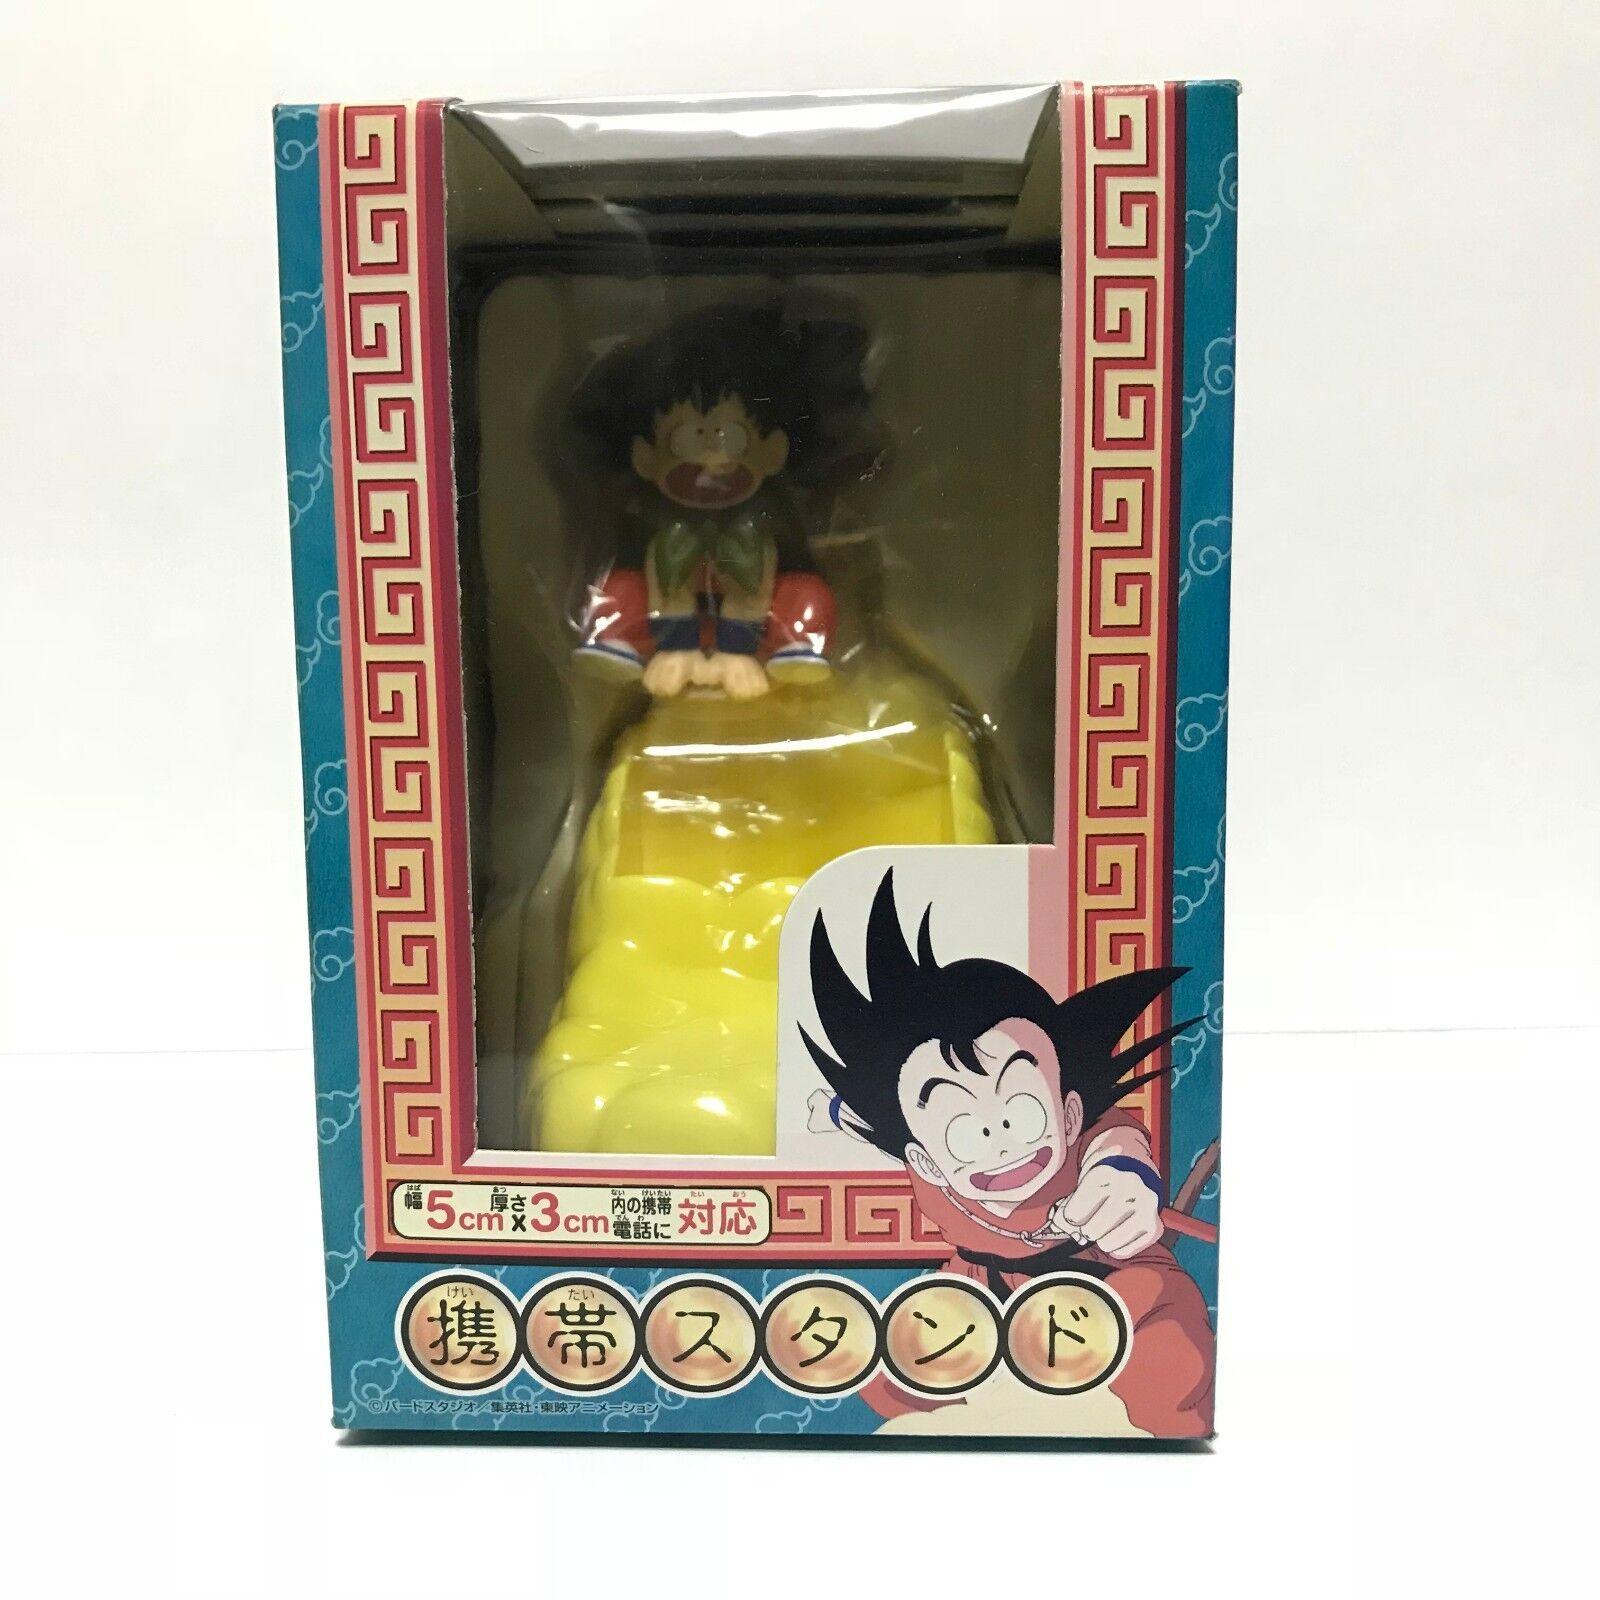 Dragon Ball Son Goku mobile phone stand Banpresto Japan Authentic Rare NEW